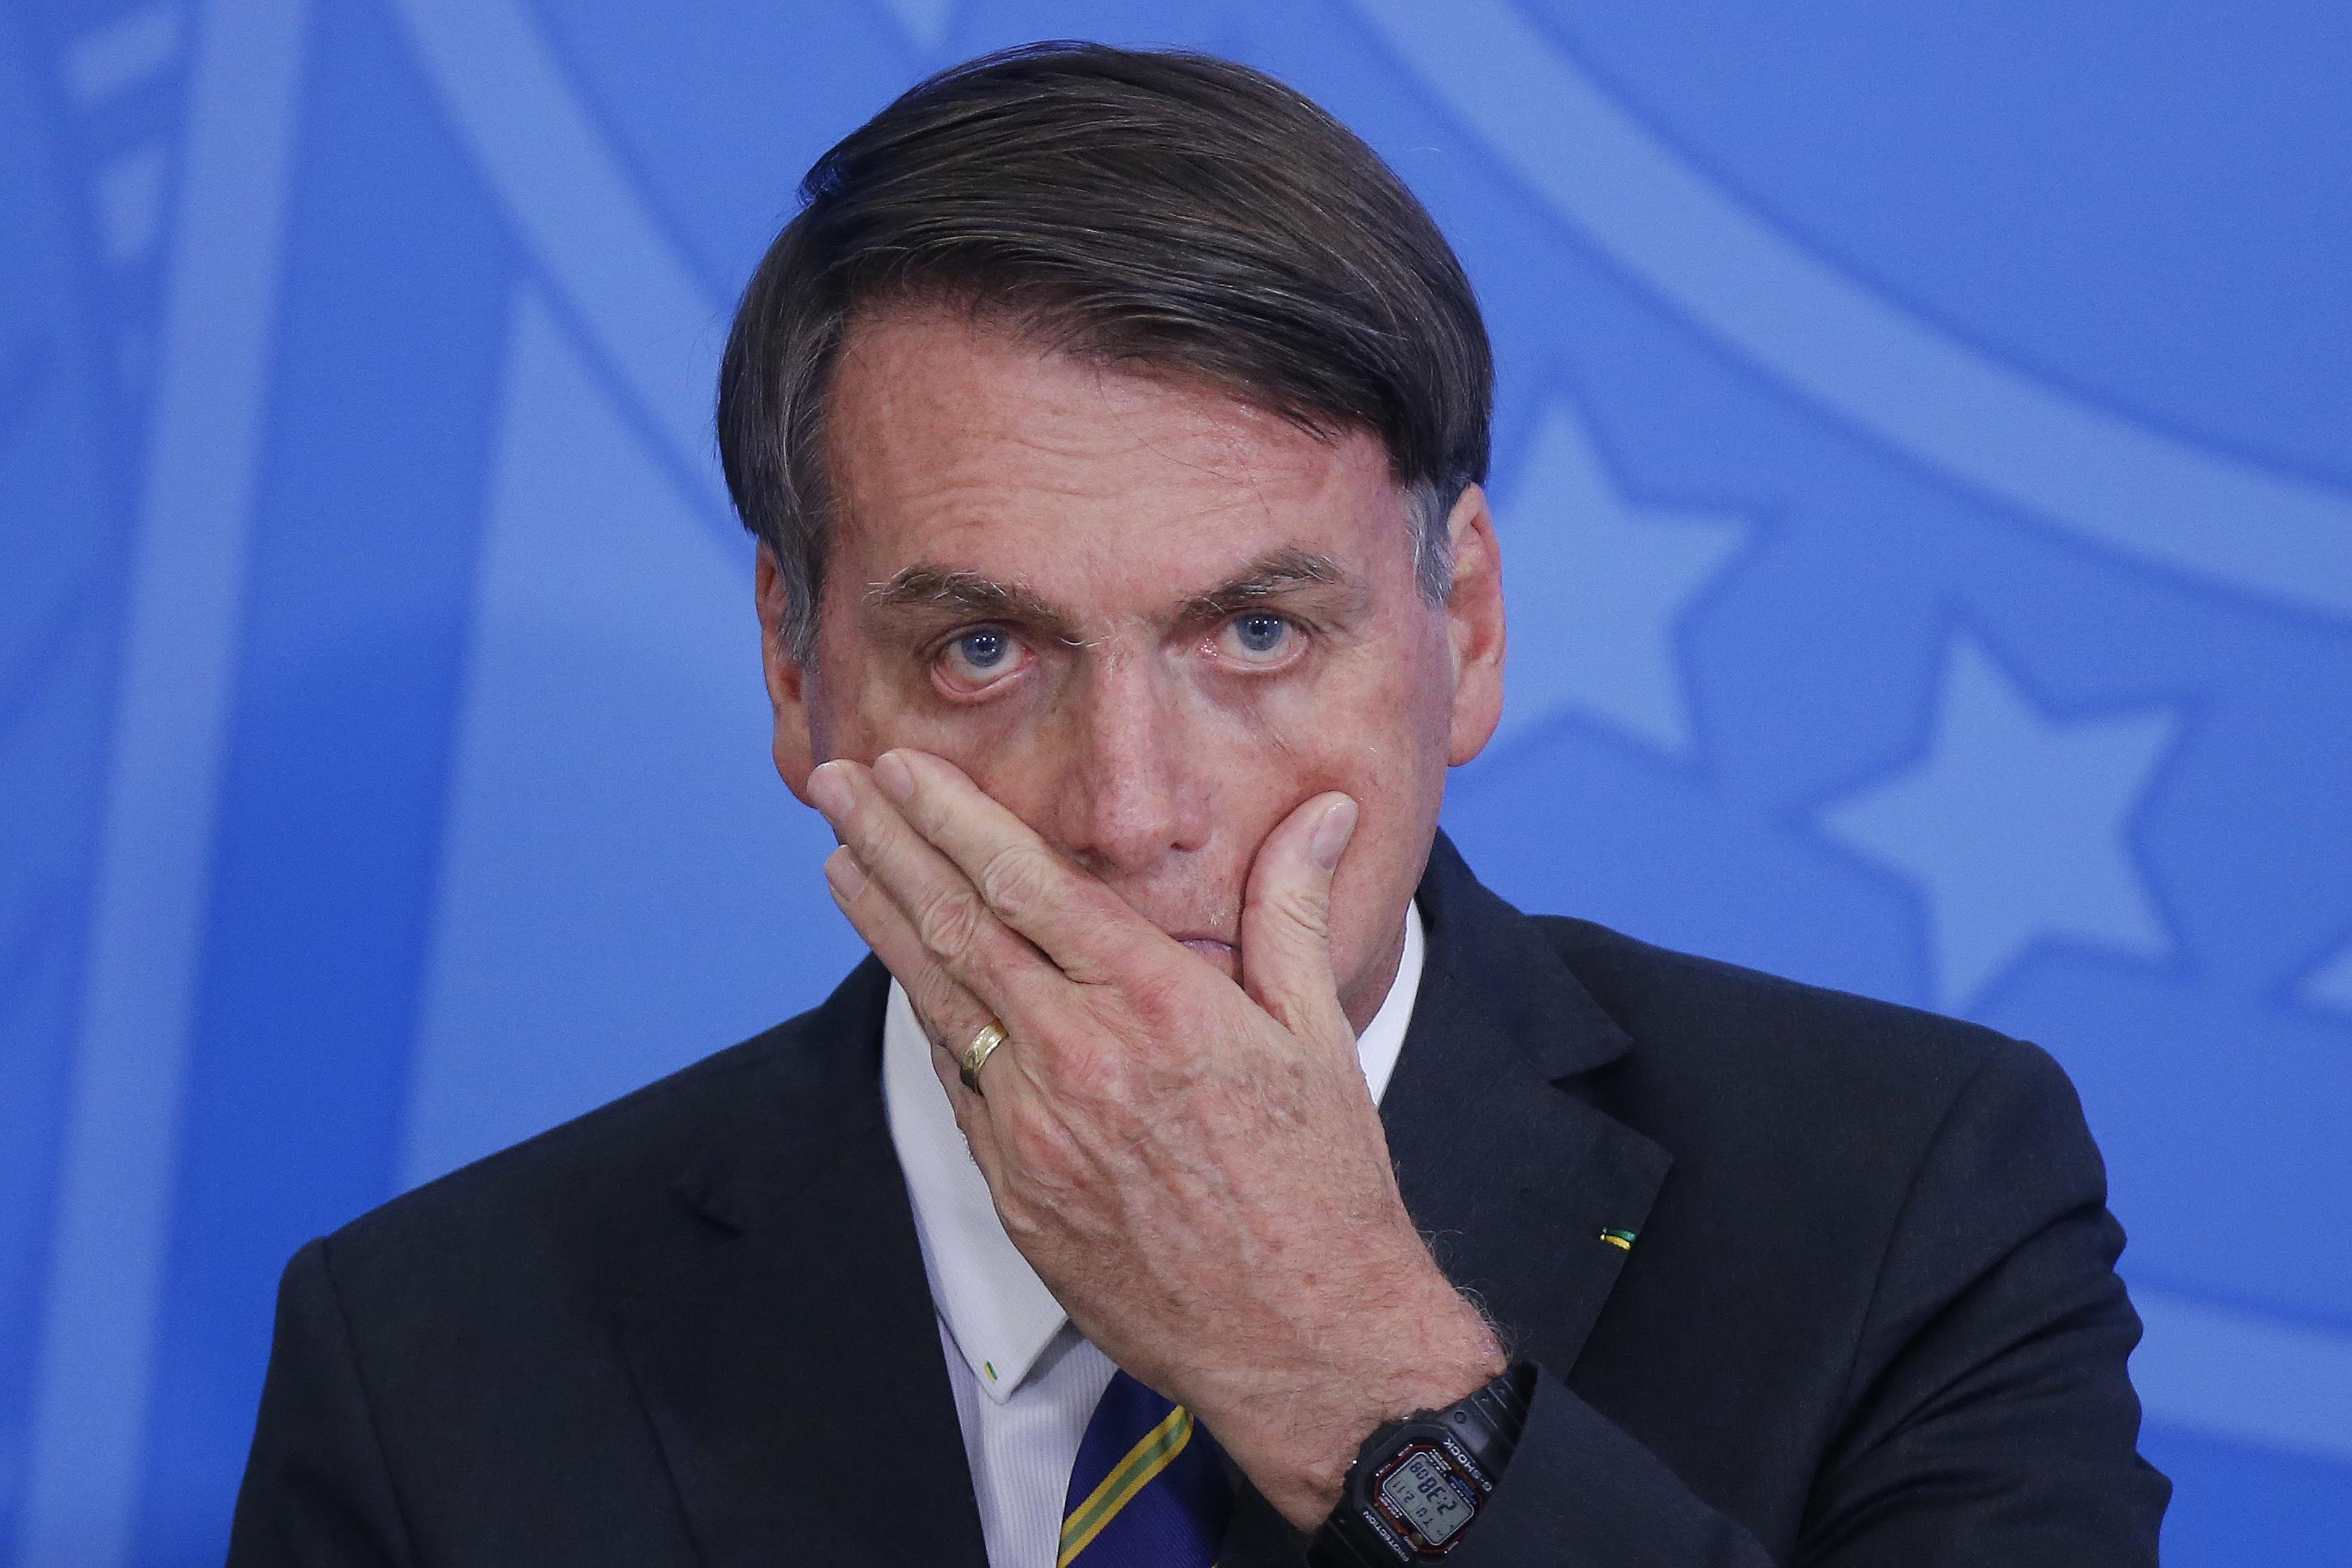 IMAGEM: Greenpeace rebate Bolsonaro, que chamou ONG de 'lixo'